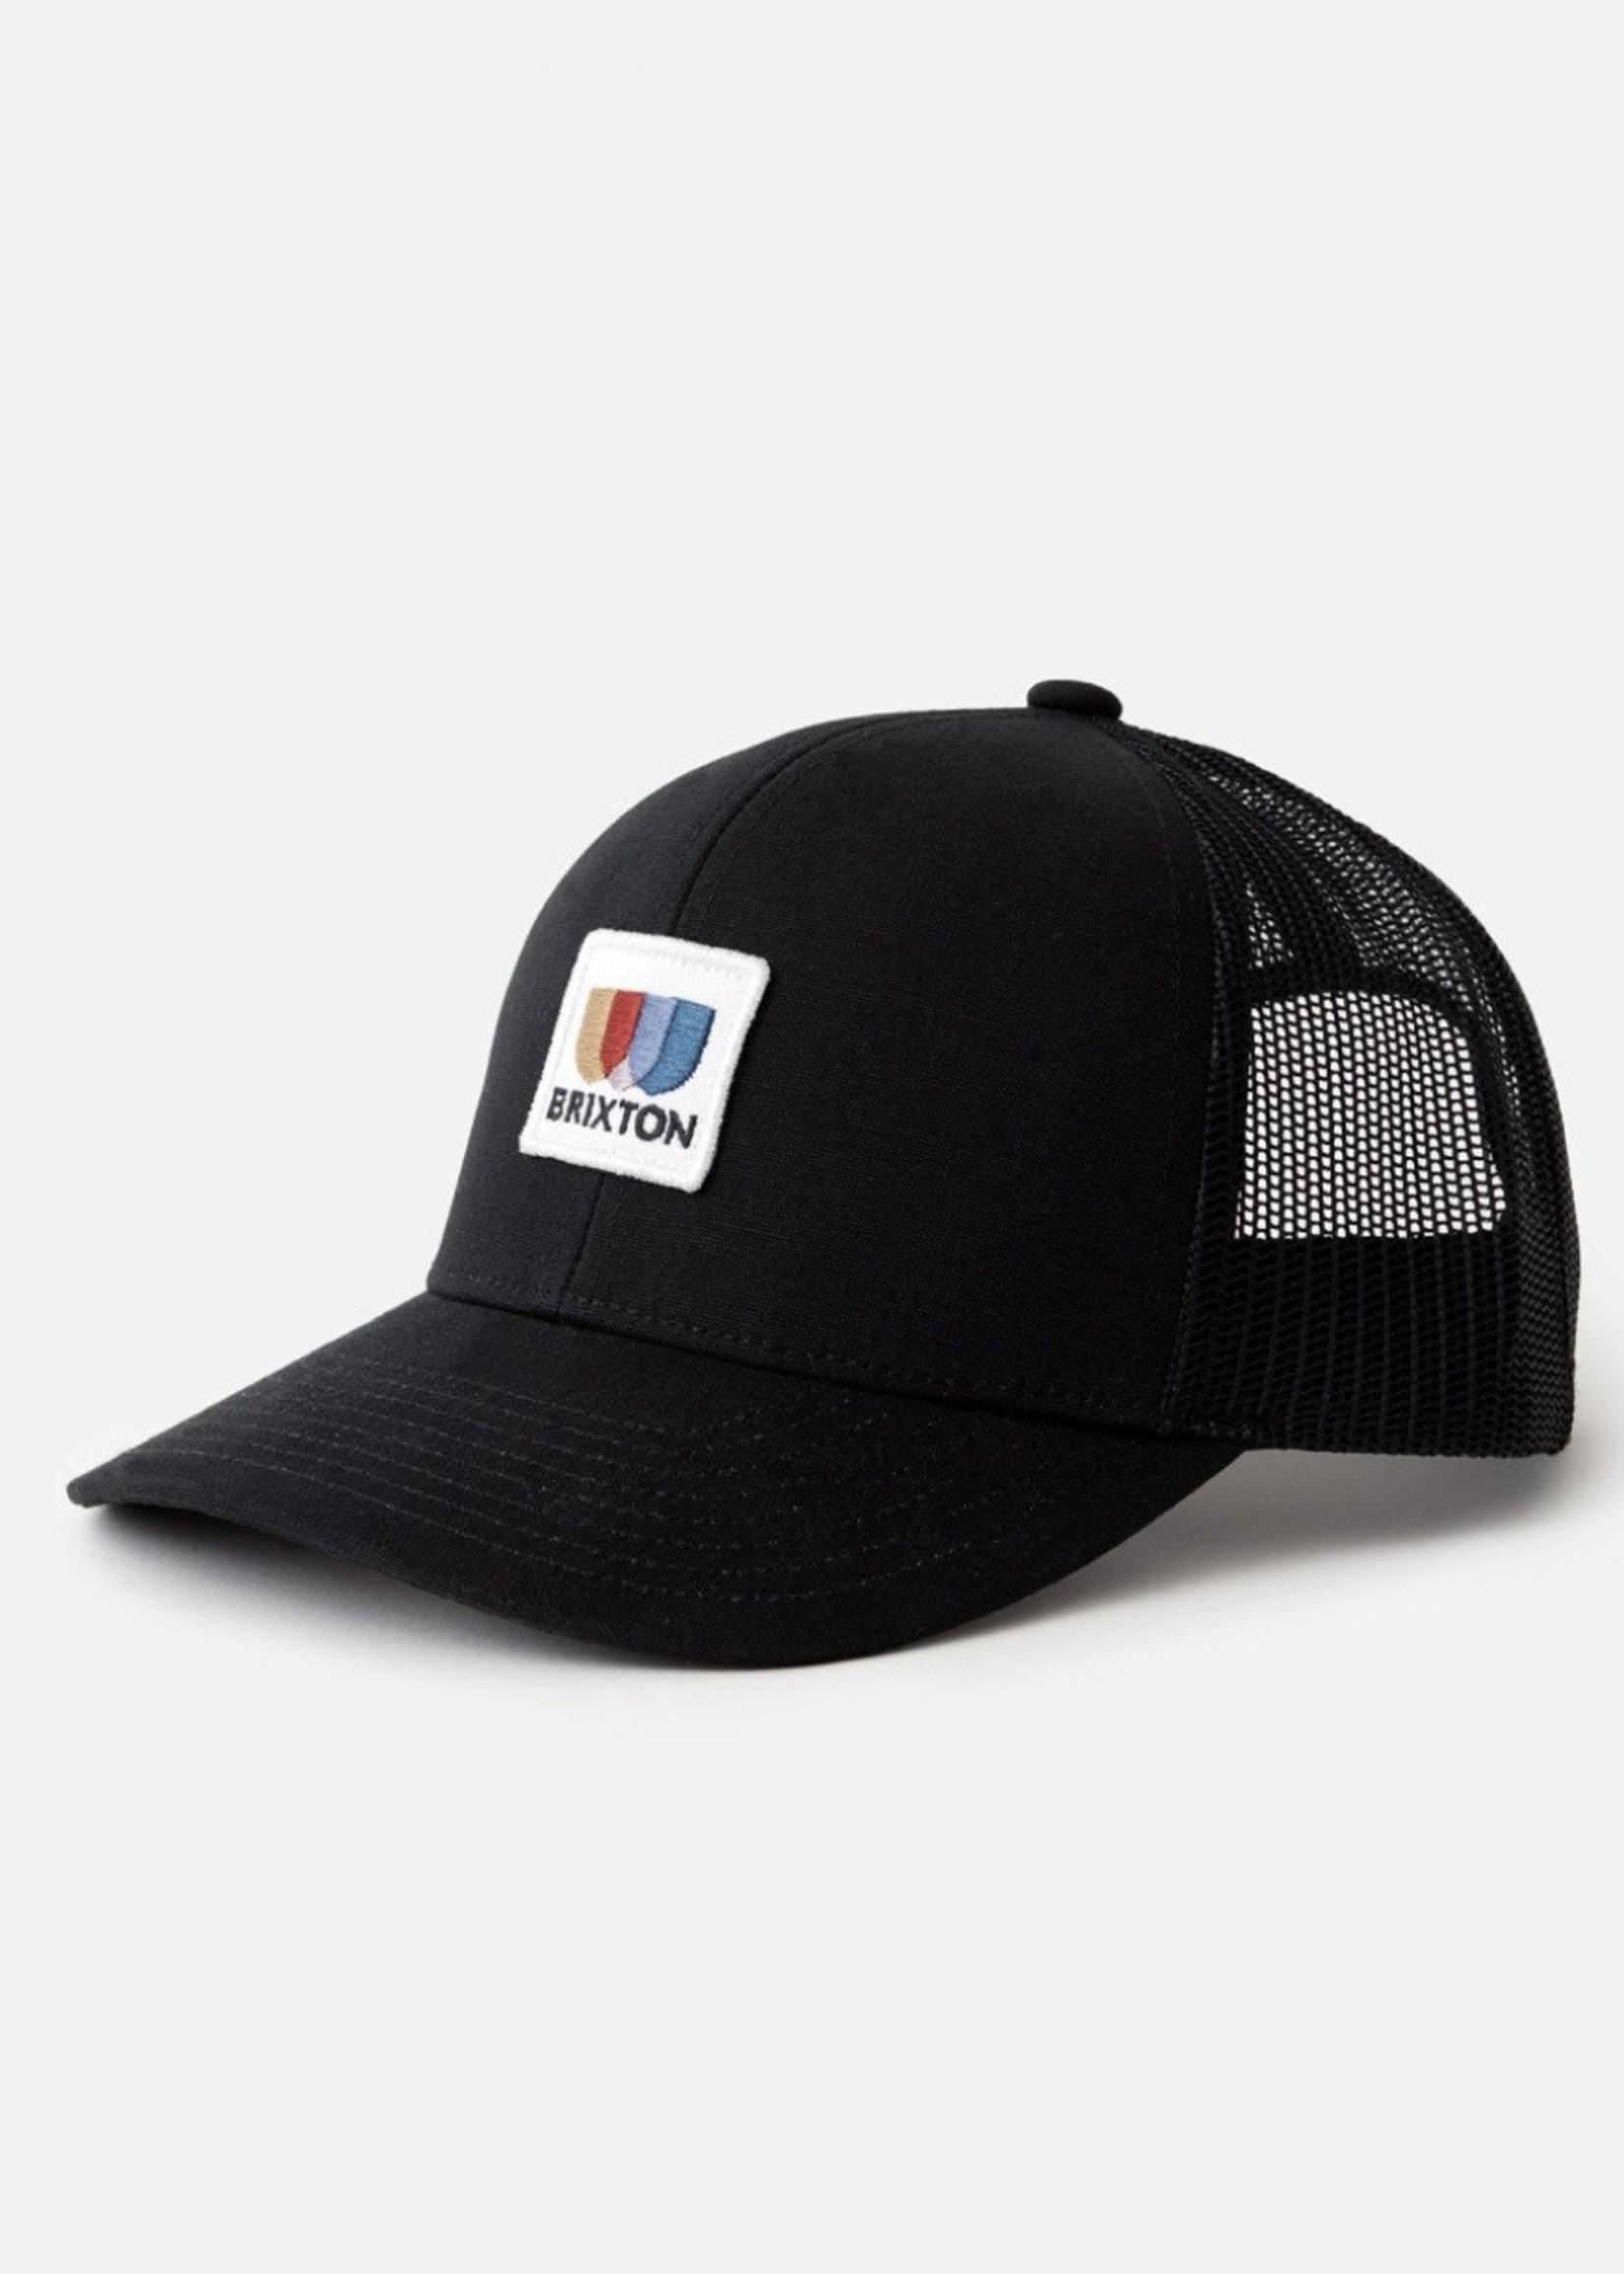 BRIXTON Alton Mesh Cap BLACK